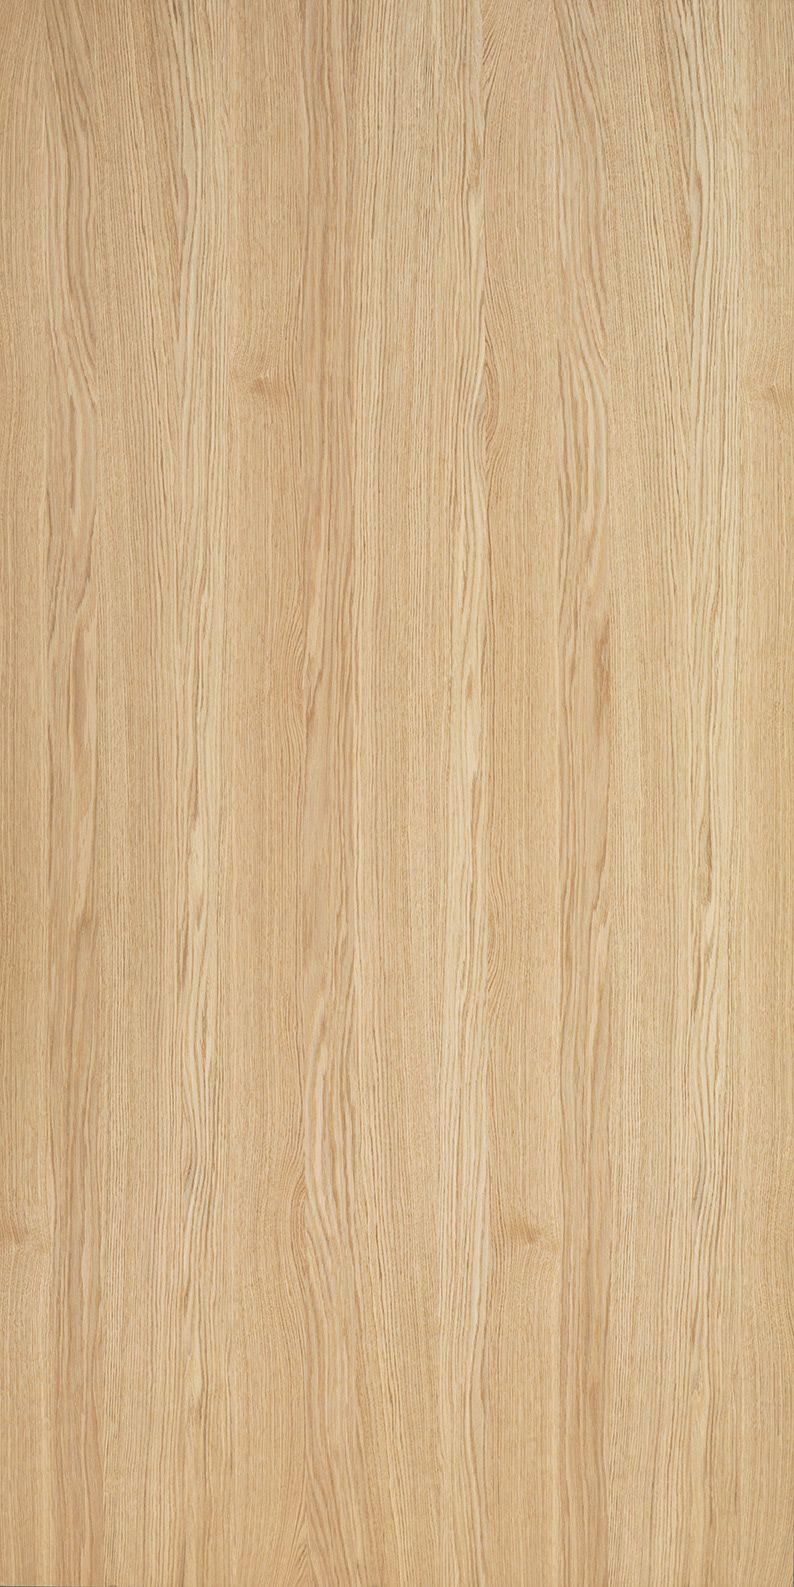 FREE 13 plaats of WOOD Texture - OAK NATURAL ALLEGRO